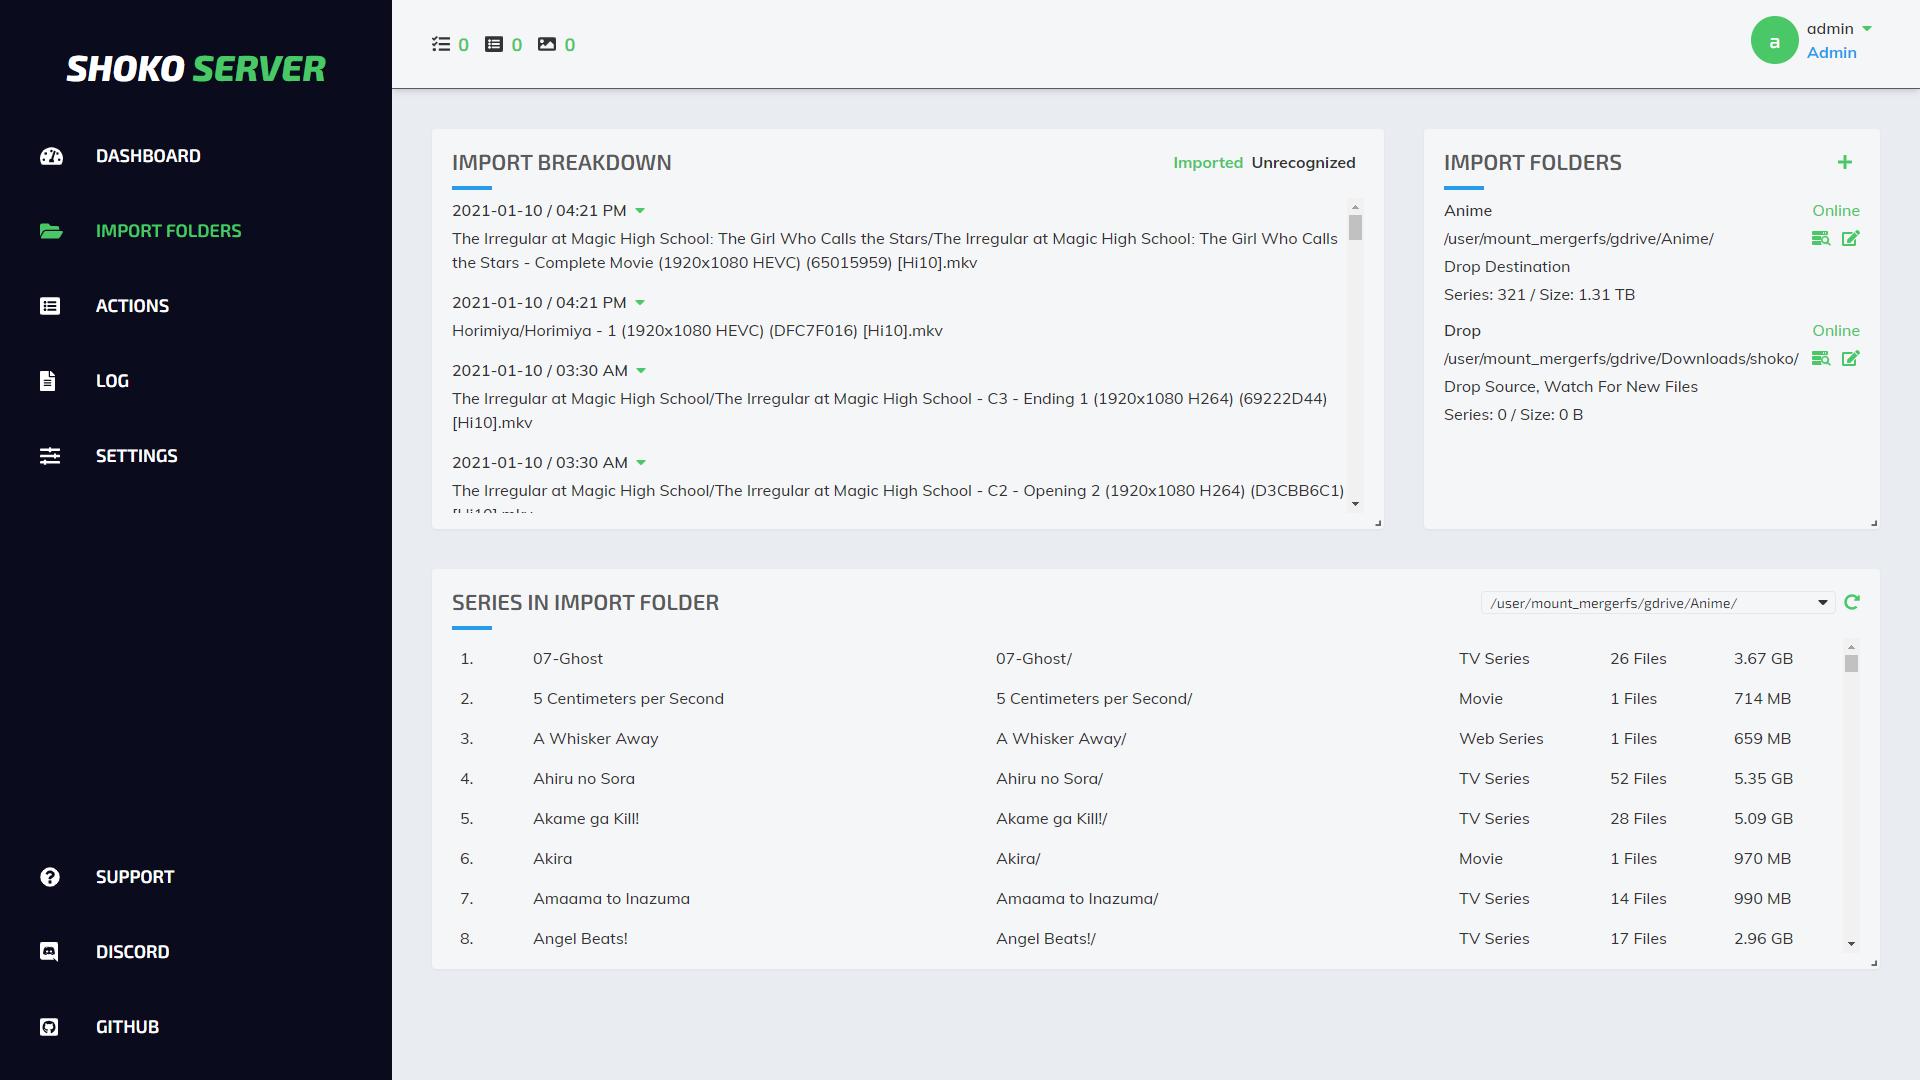 WebUI-Import-Folders.png